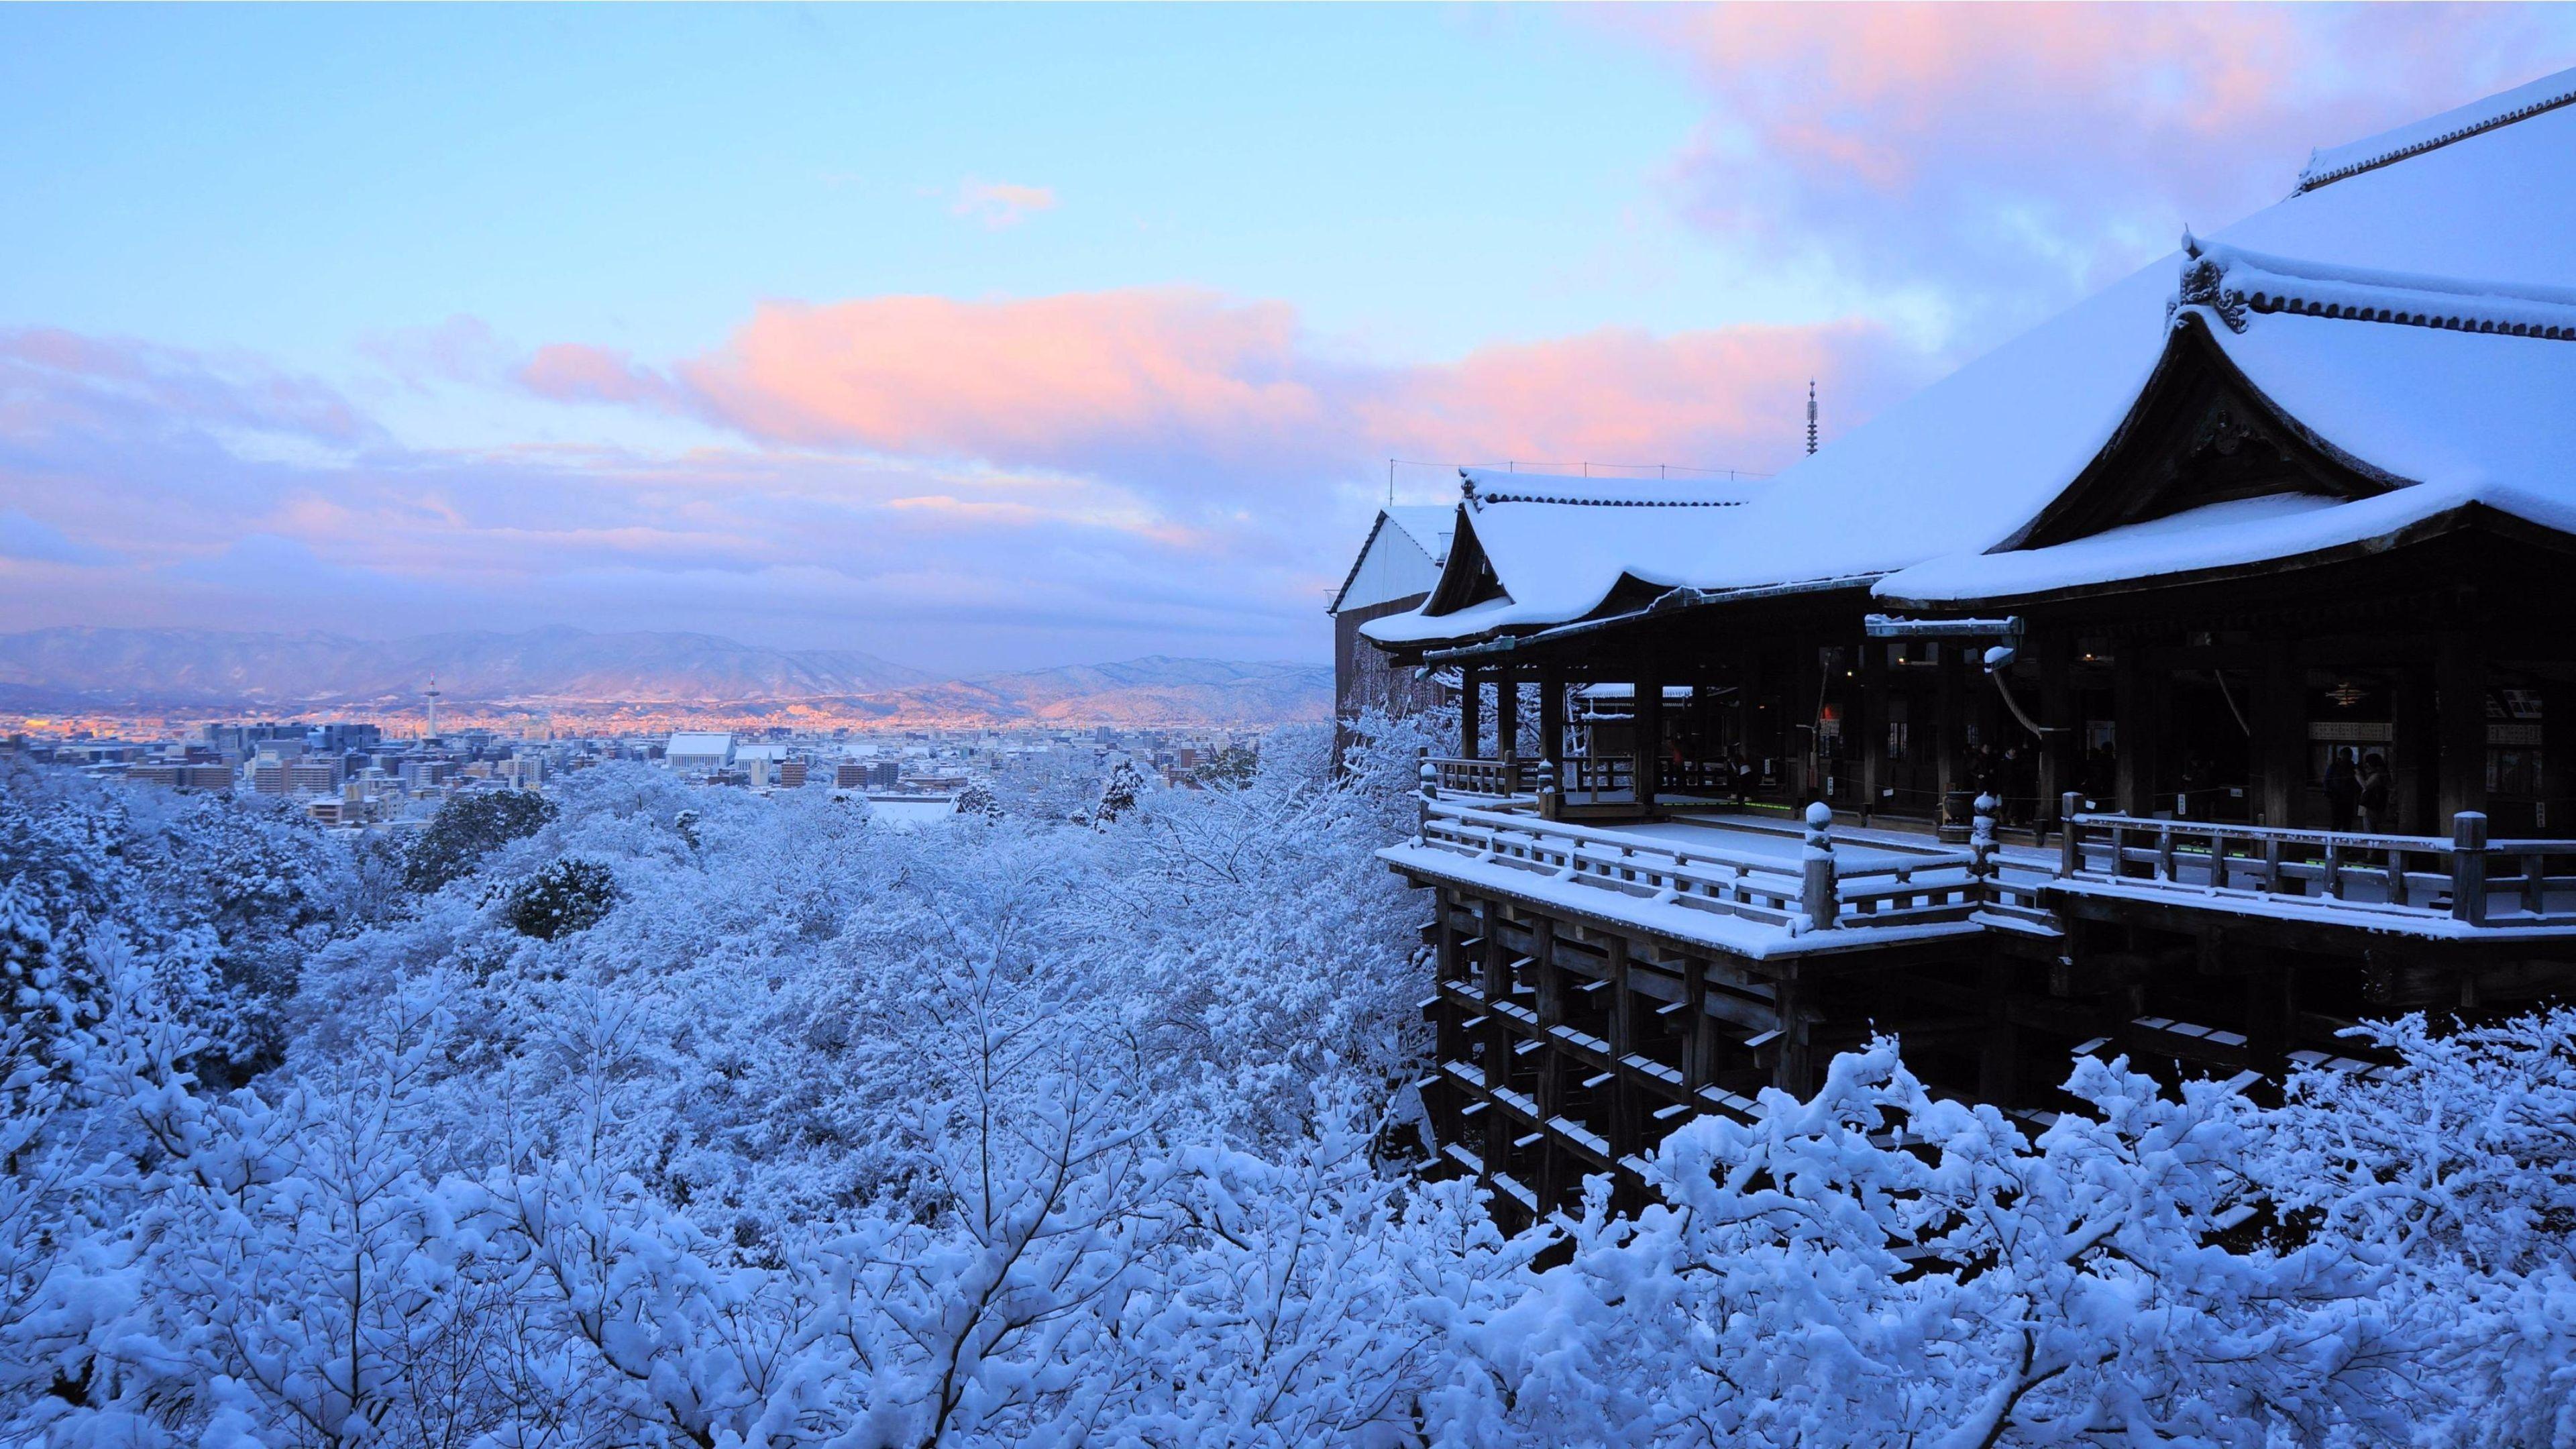 3840x2160 Amazing Winter 2016 Kyoto Japan 4k Wallpaper Free 4k Wallpaper Winter In Japan Kyoto Japan Japan